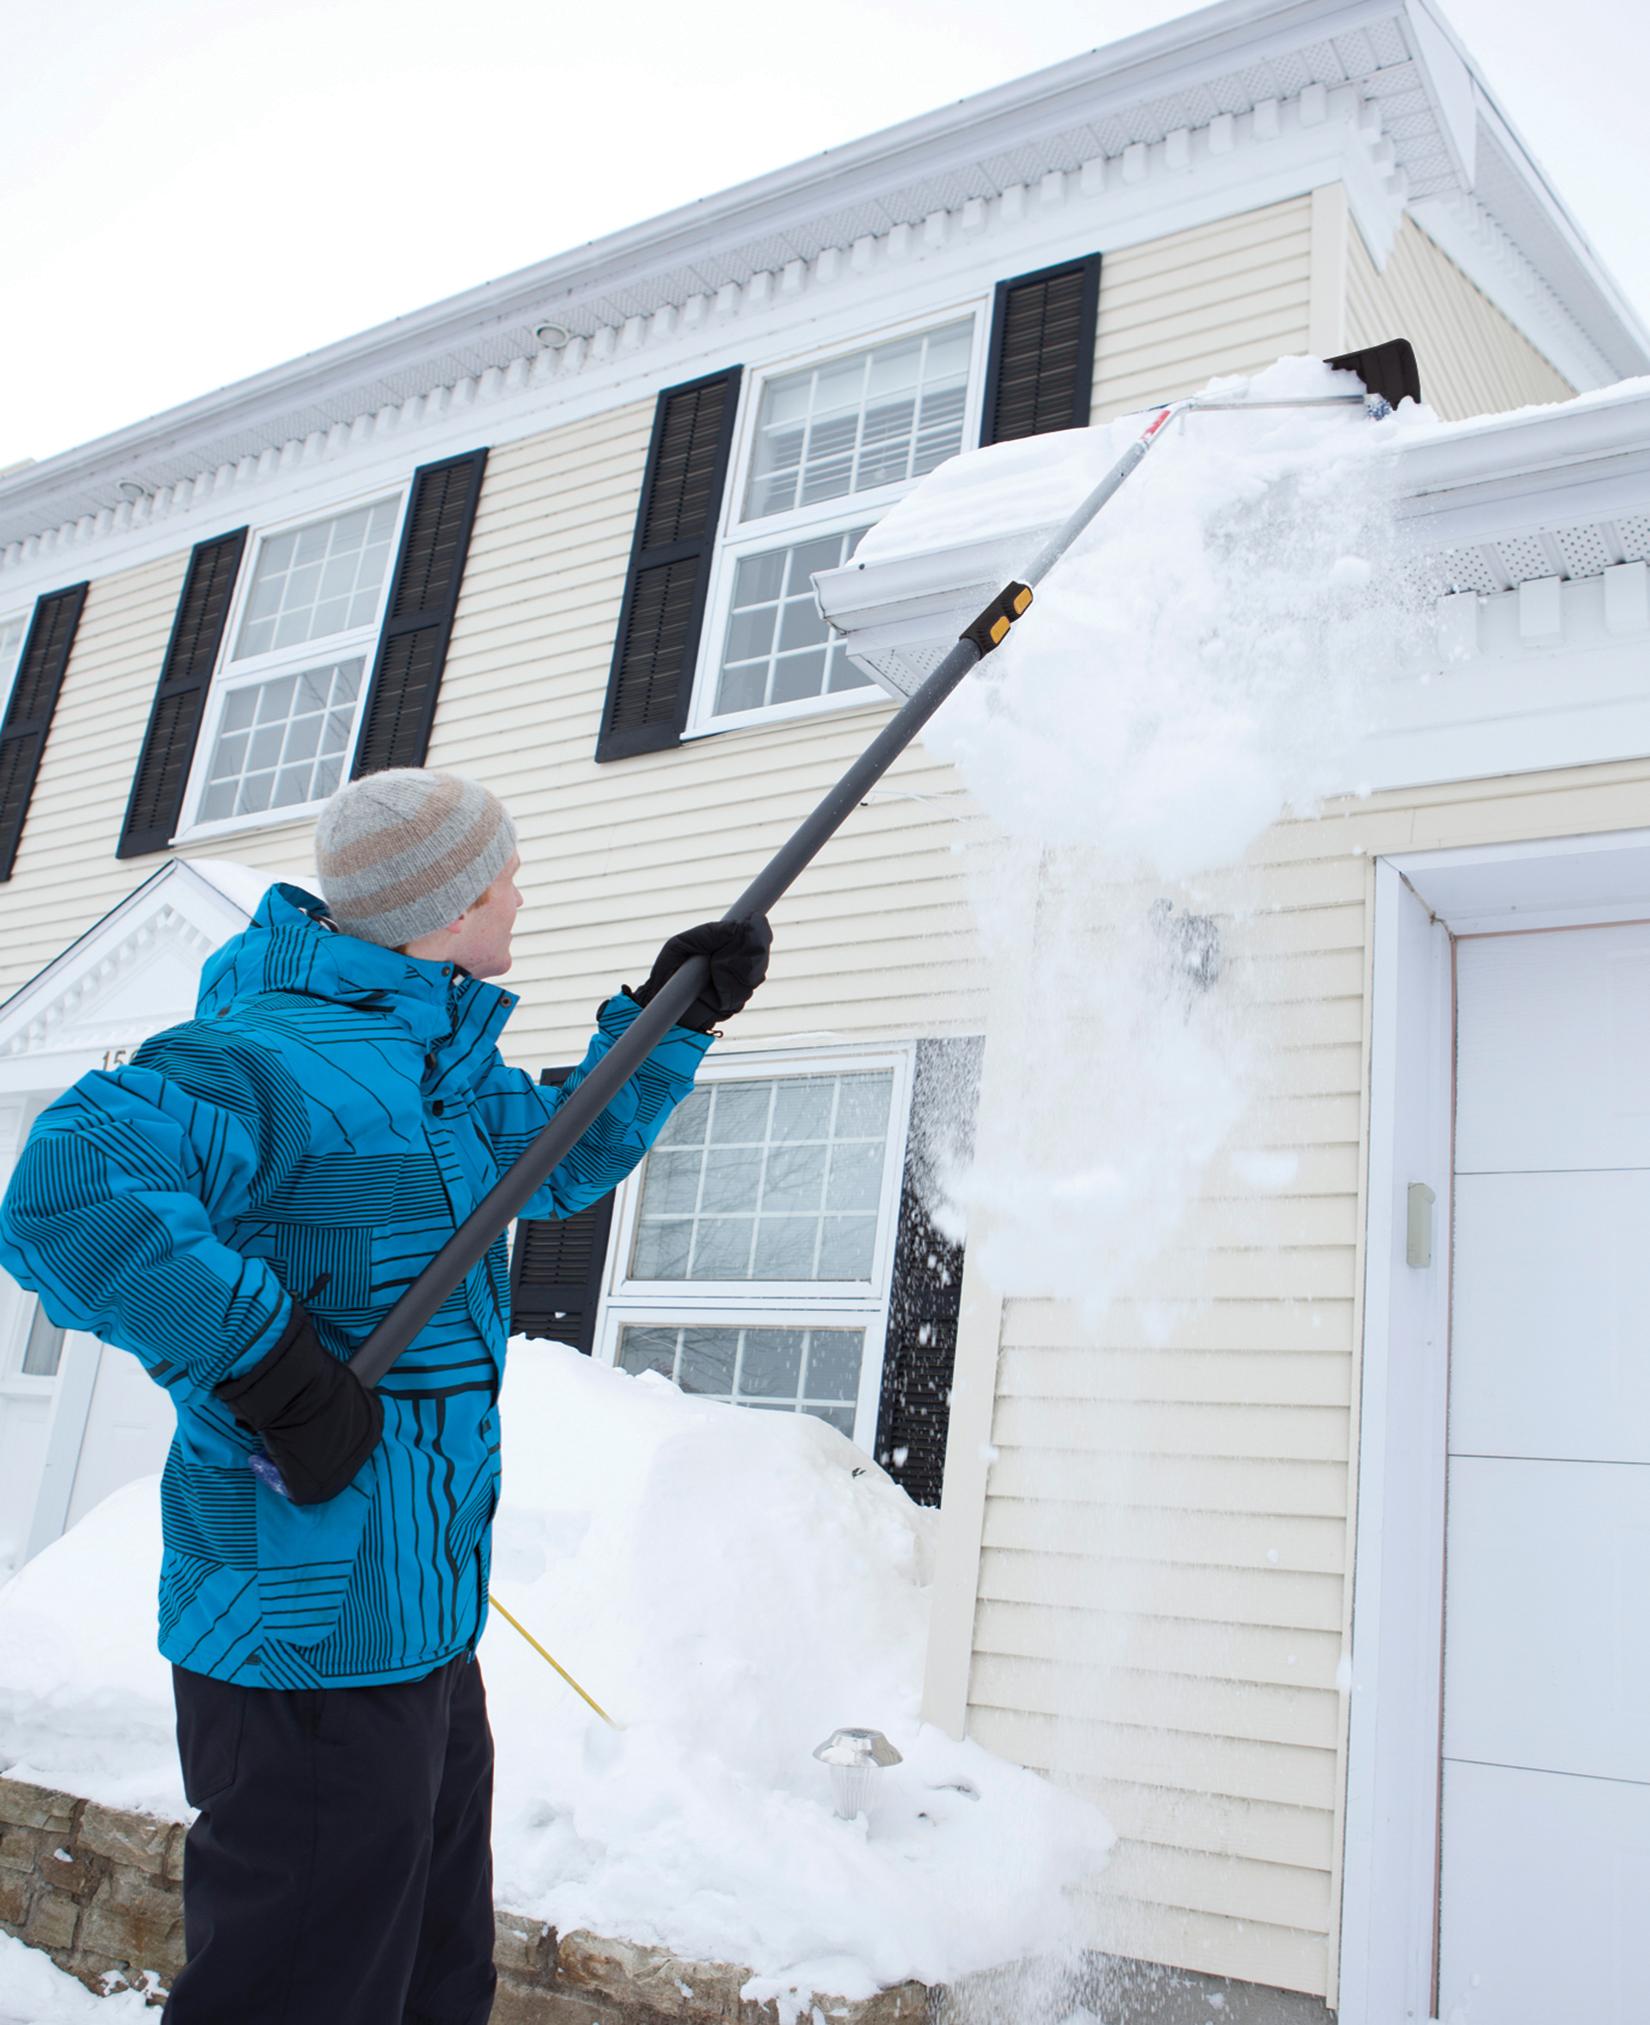 Telescoping Snow Roof Rake True Temper 174 Tools